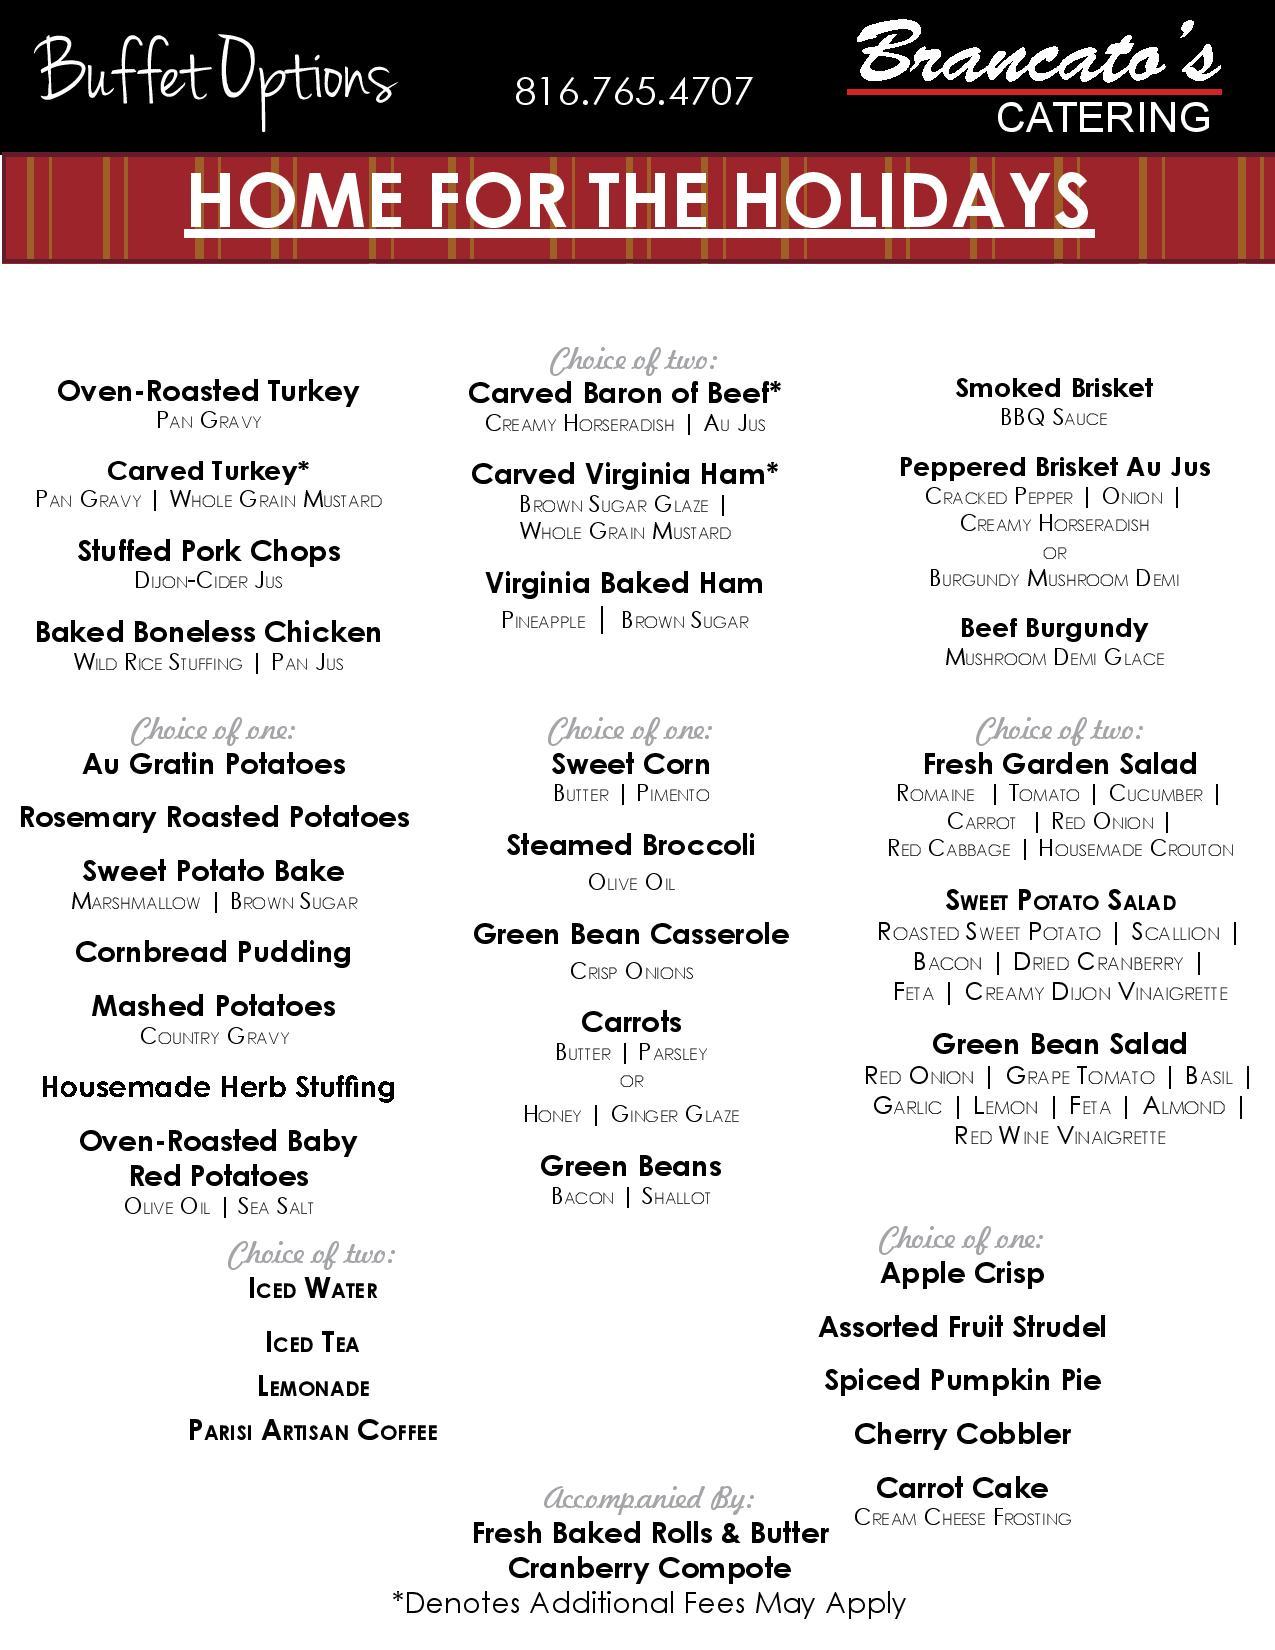 Full Service And Express Holiday Menus Catering Kansas City